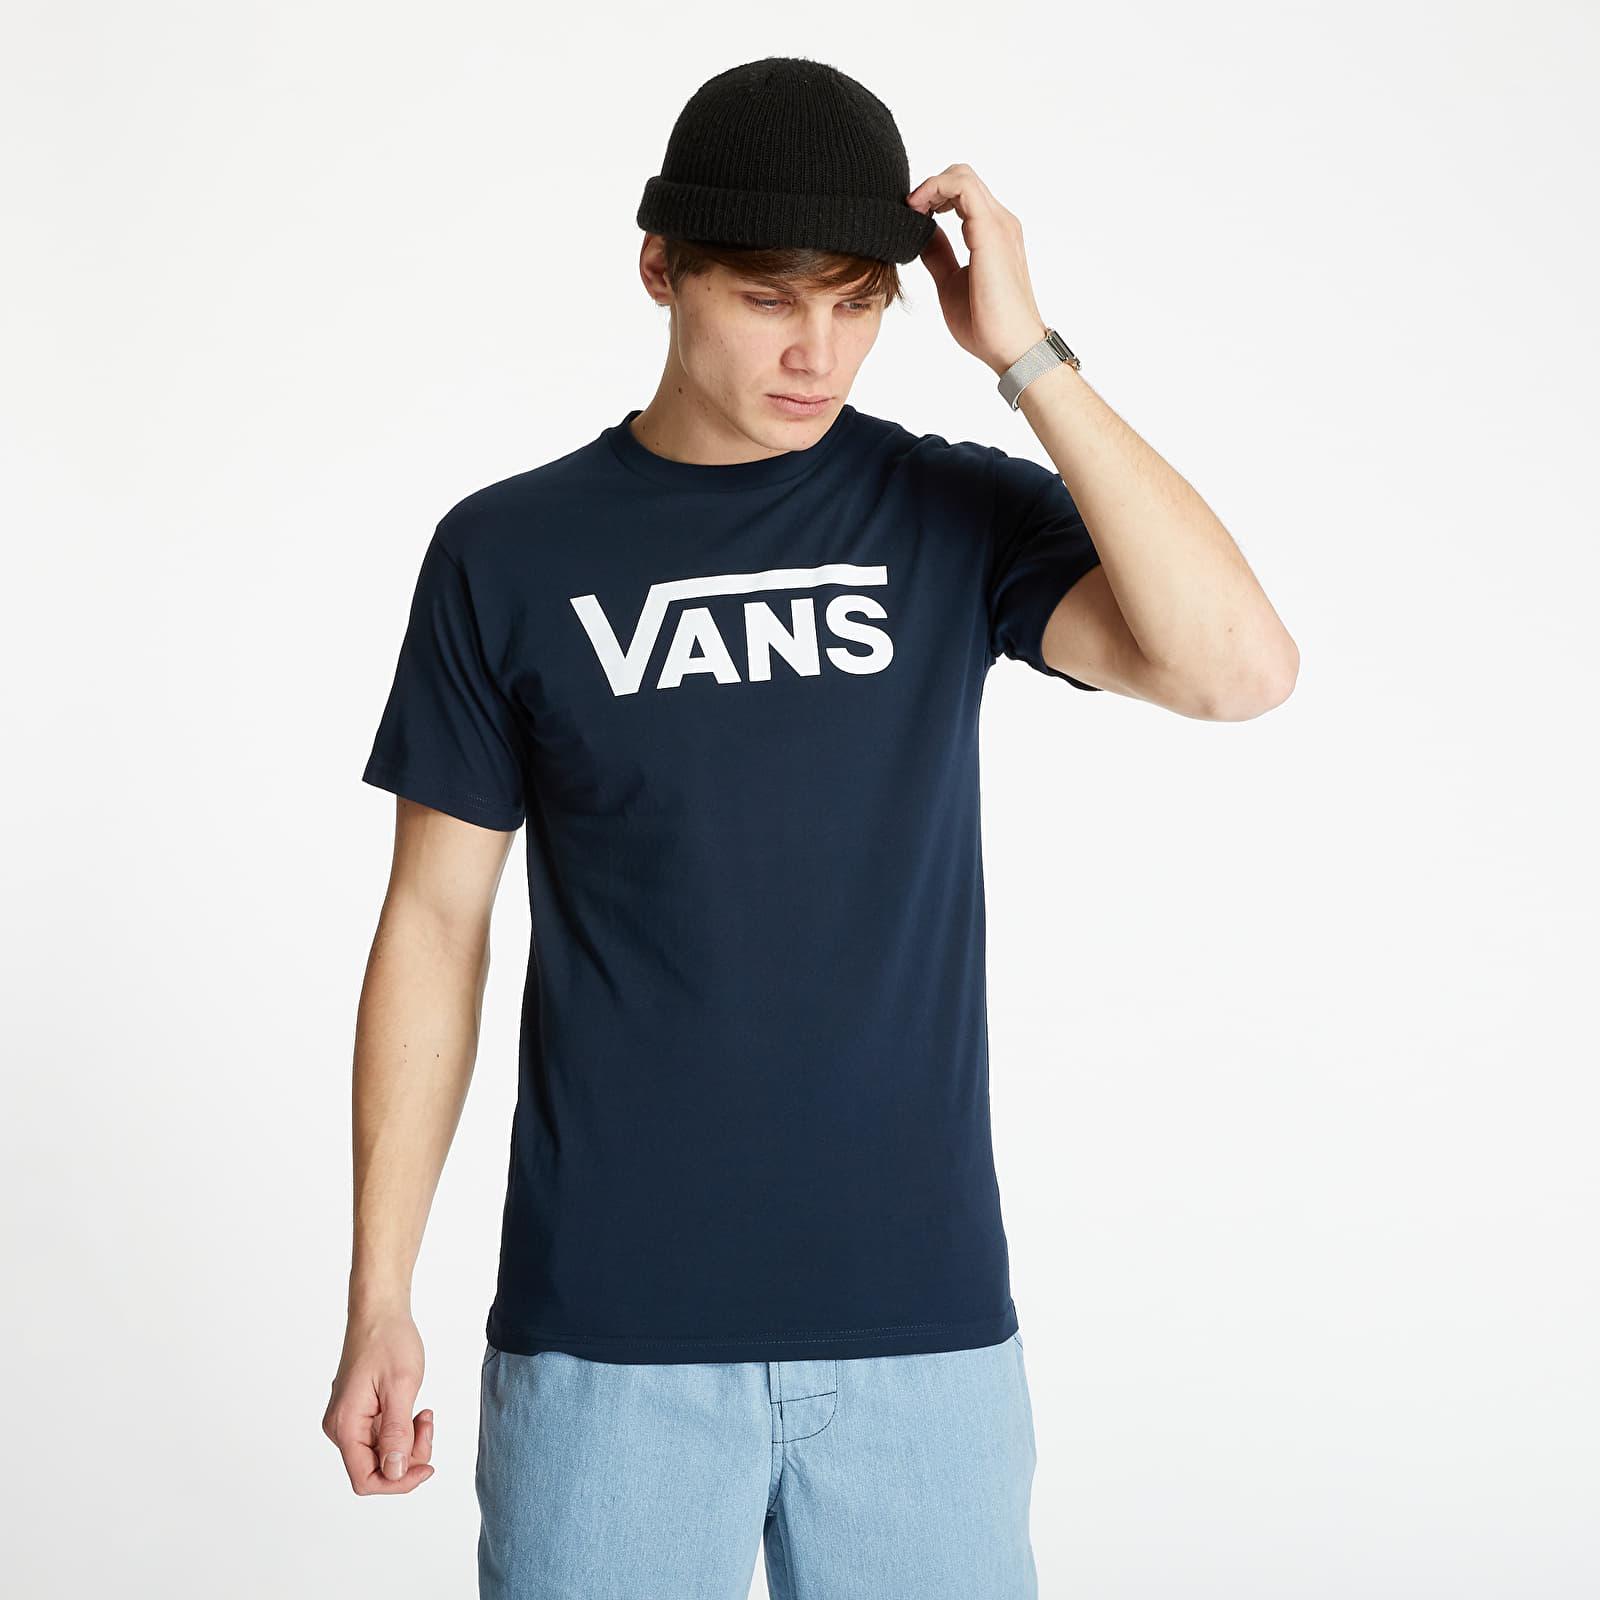 Vans Classic Tee Navy/ White S